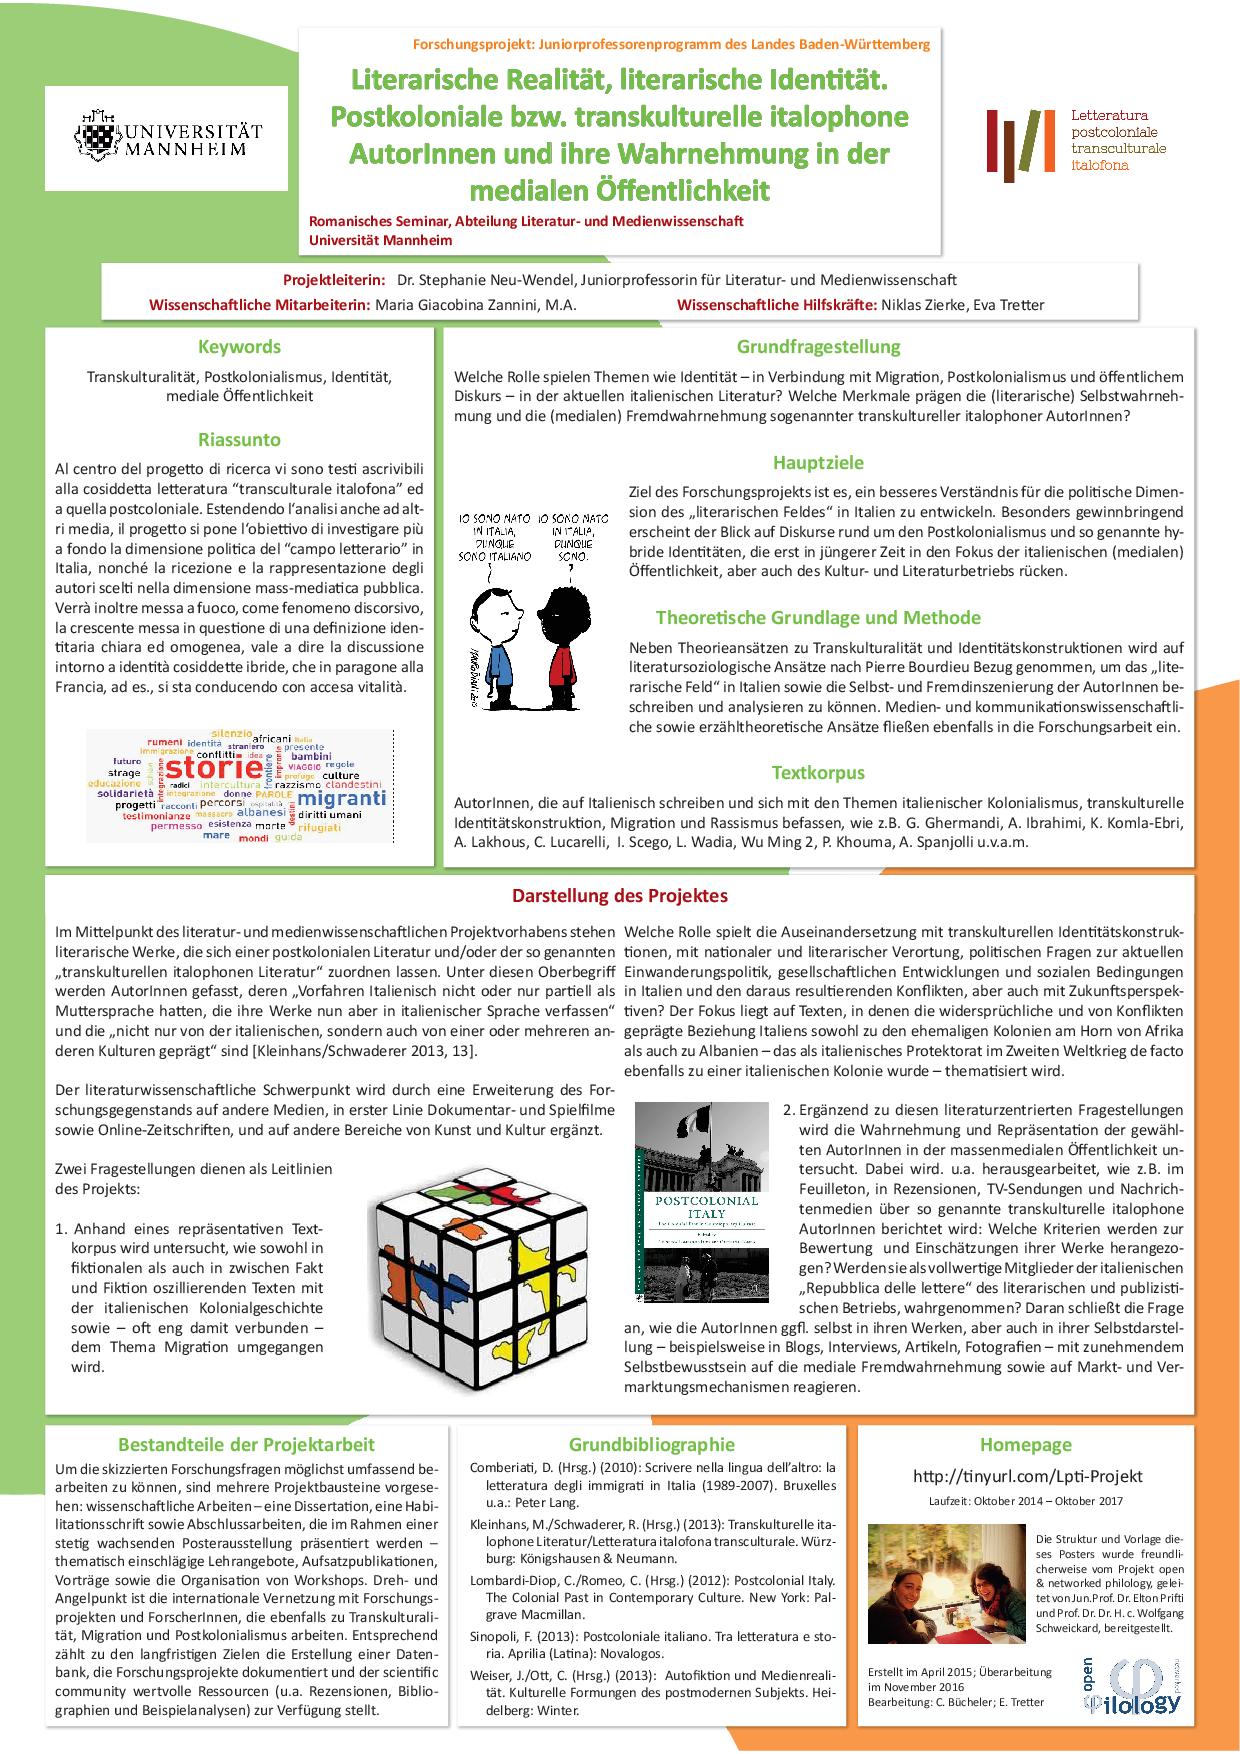 Exelent Forschungsprojektvorlage Sketch - FORTSETZUNG ARBEITSBLATT ...